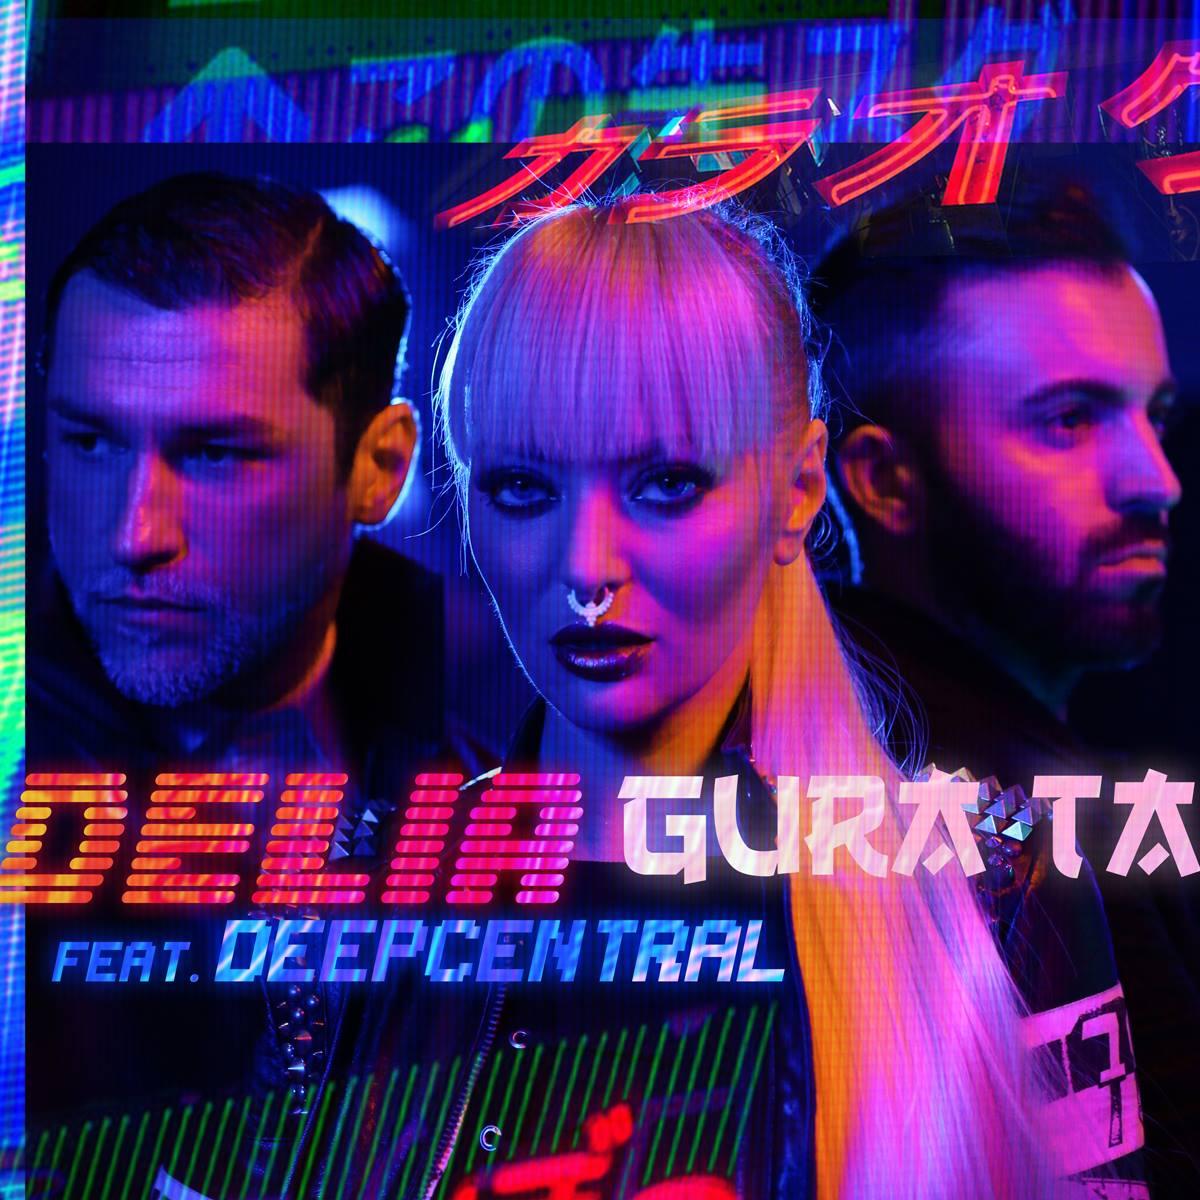 "Delia si Deepcentral lanseaza single-ul si videoclipul ""Gura ta"""